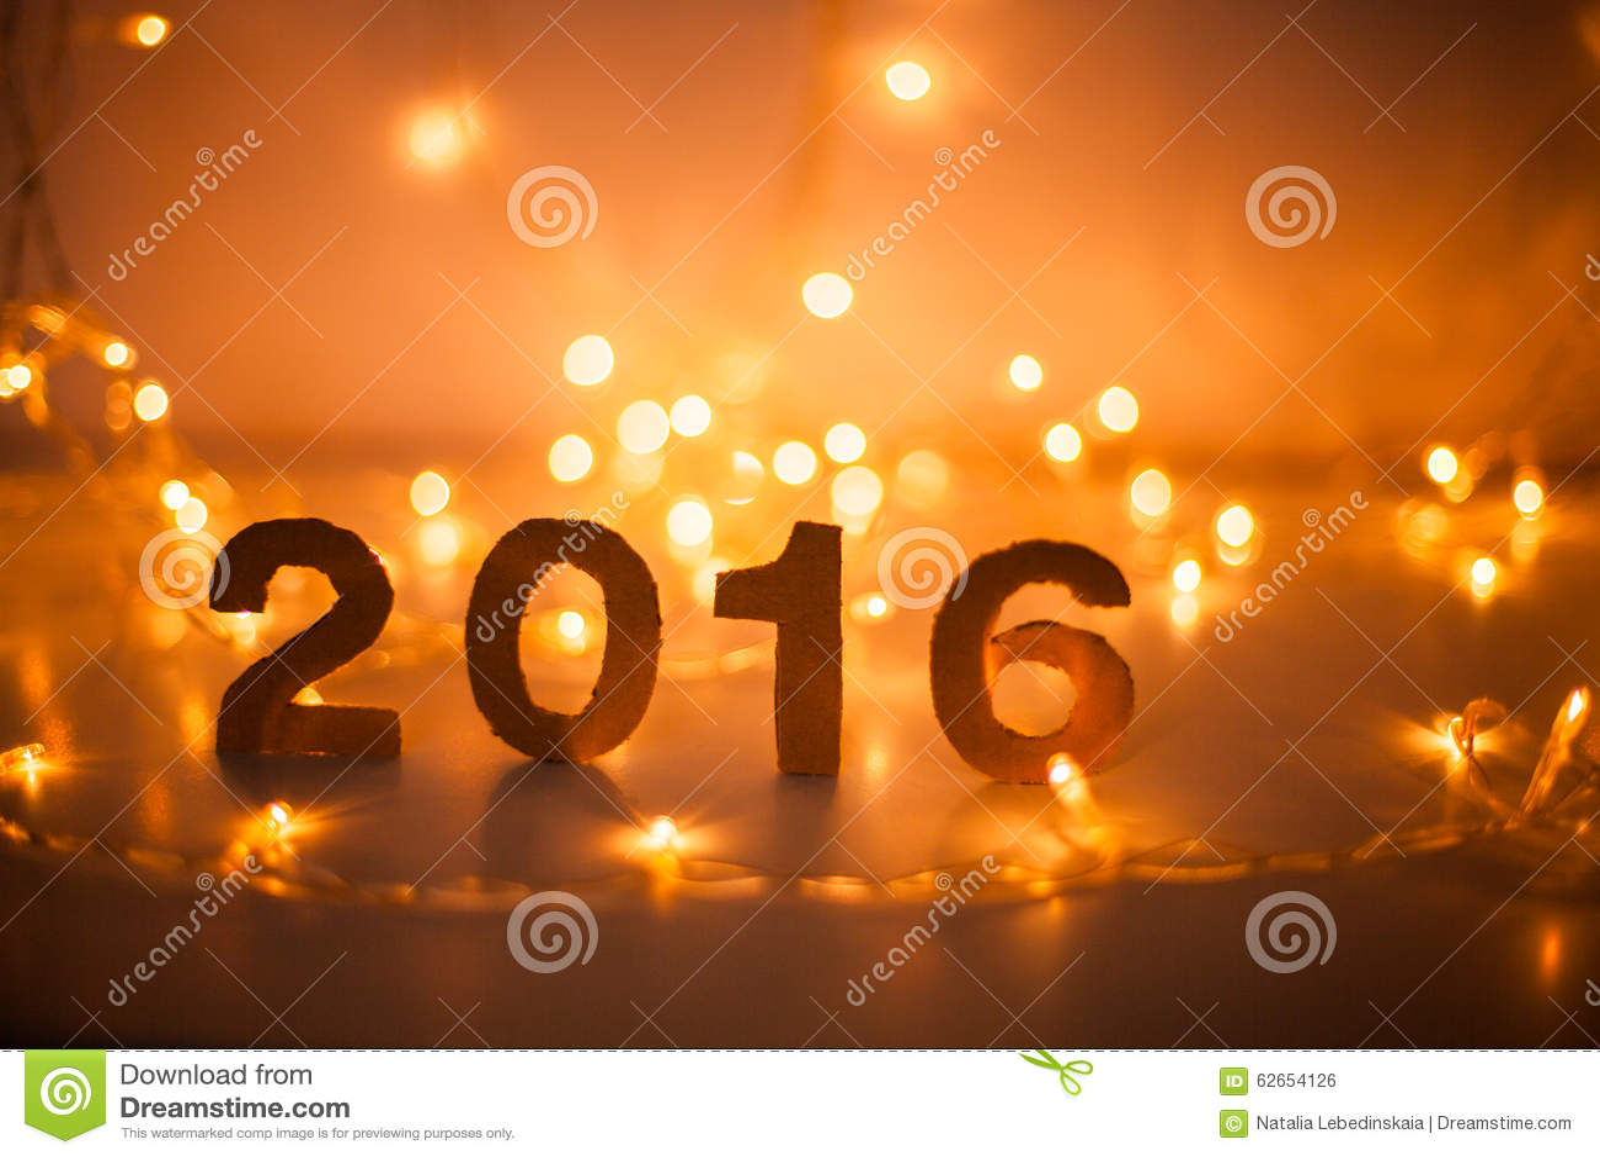 New Years Eve 2016 Lights Figures Made Of Cardboard